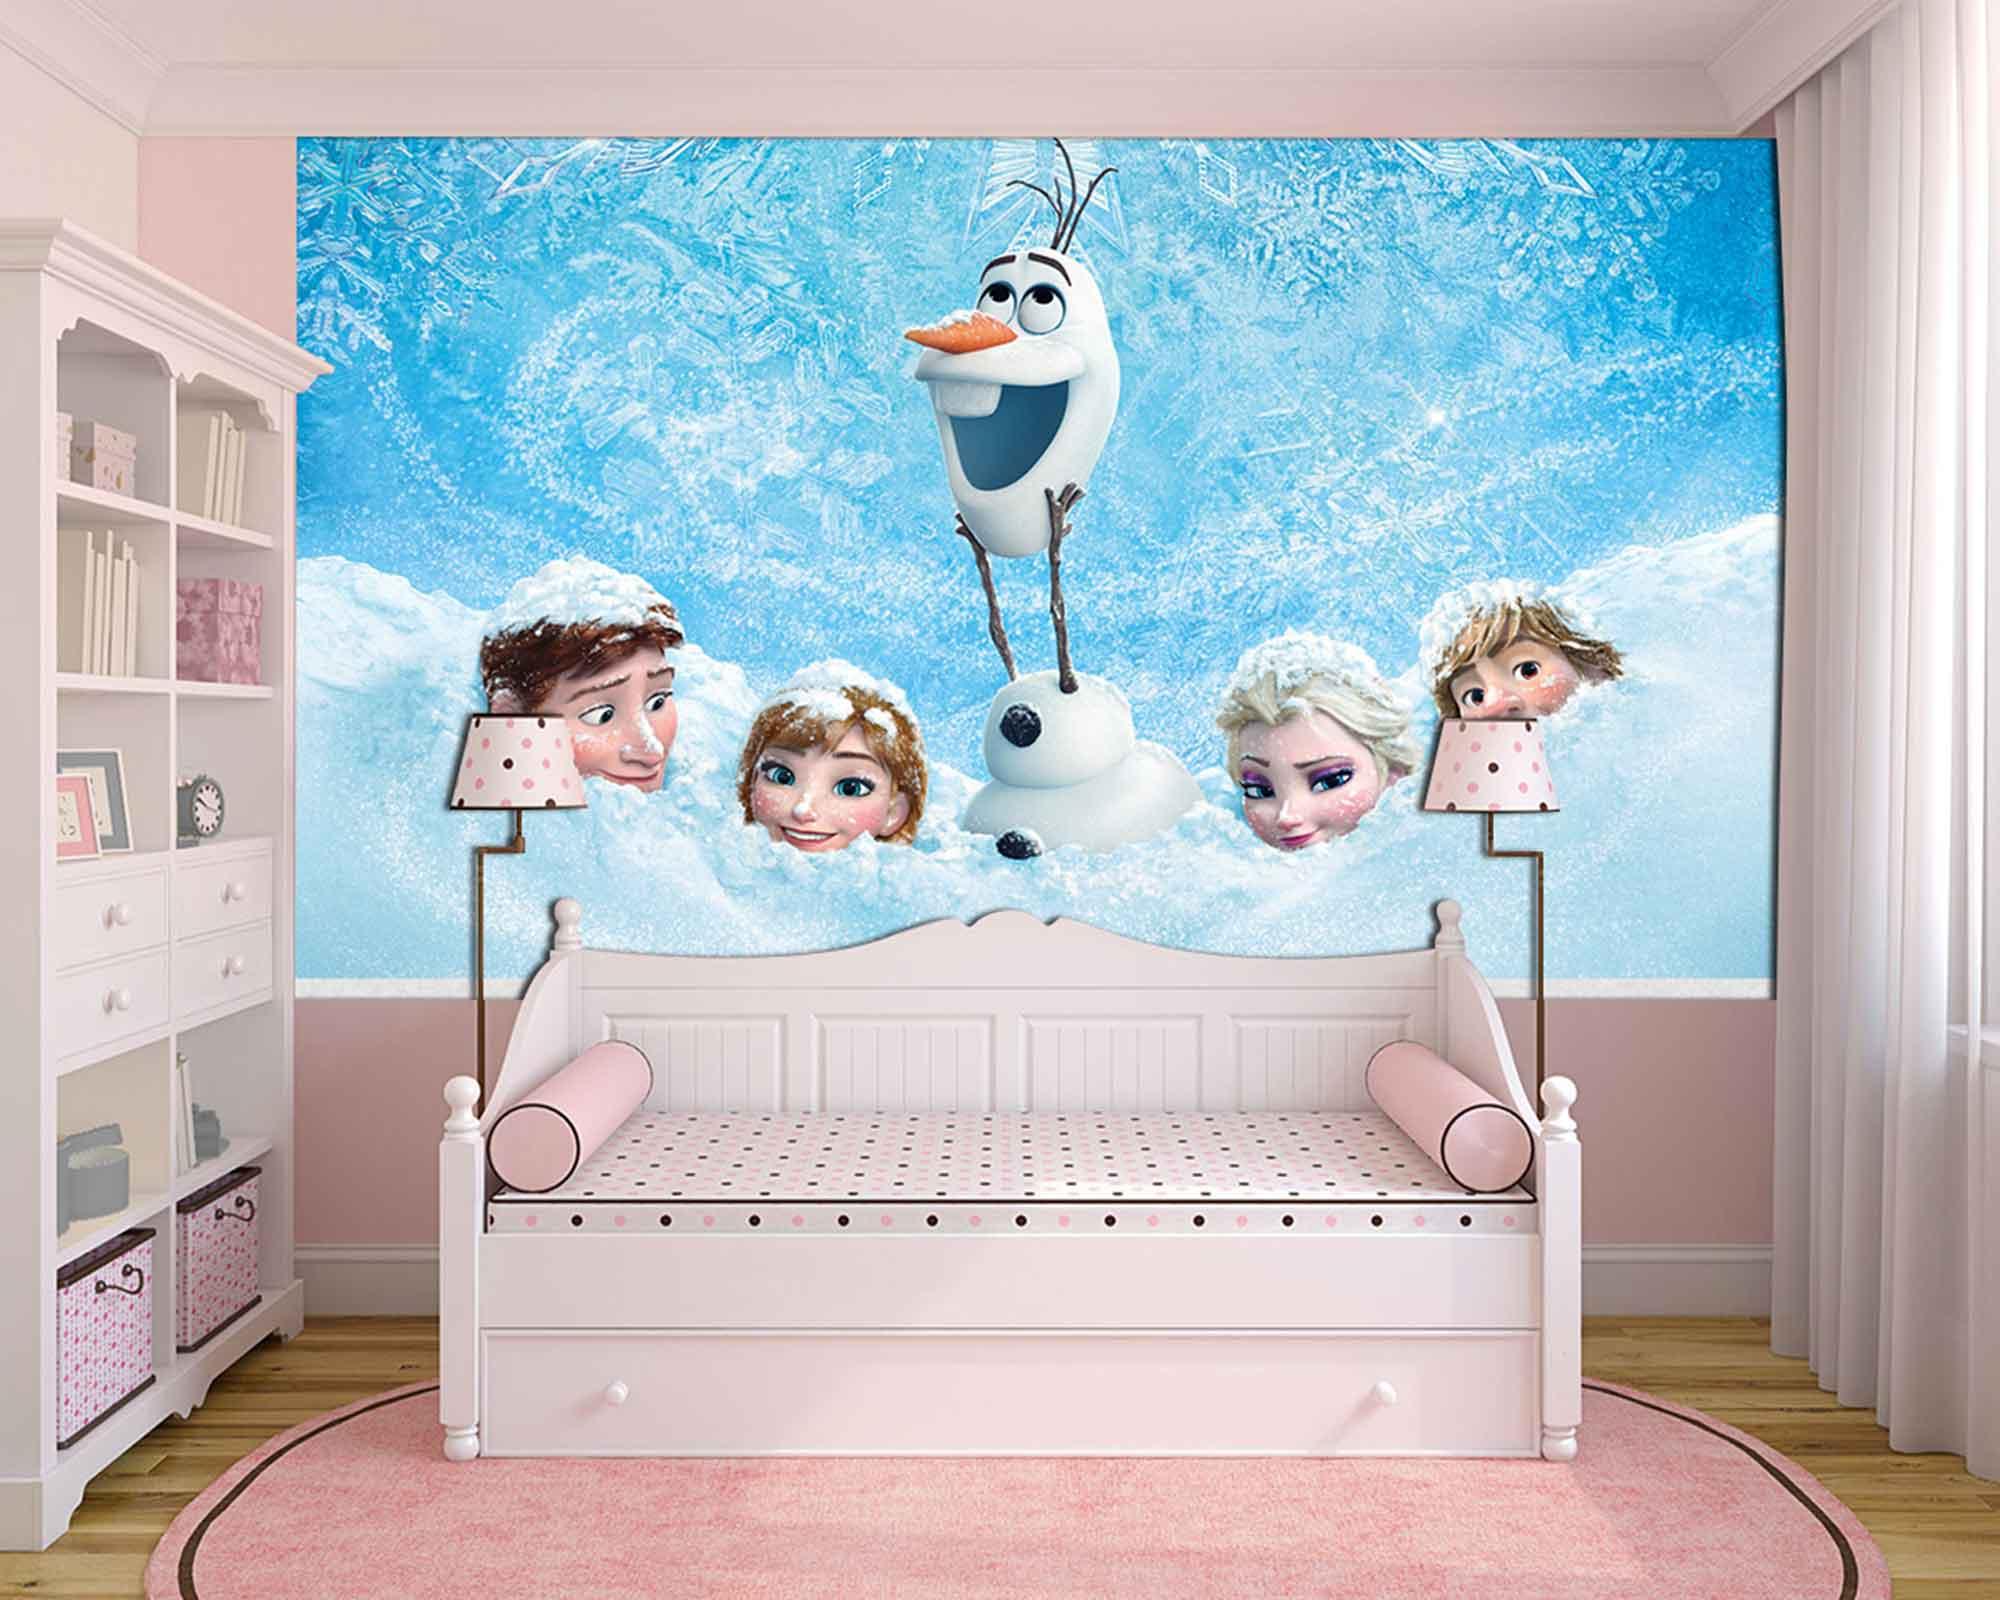 Papel de Parede Infantil Frozen 0002 - Papel de Parede para Quarto  - Paredes Decoradas